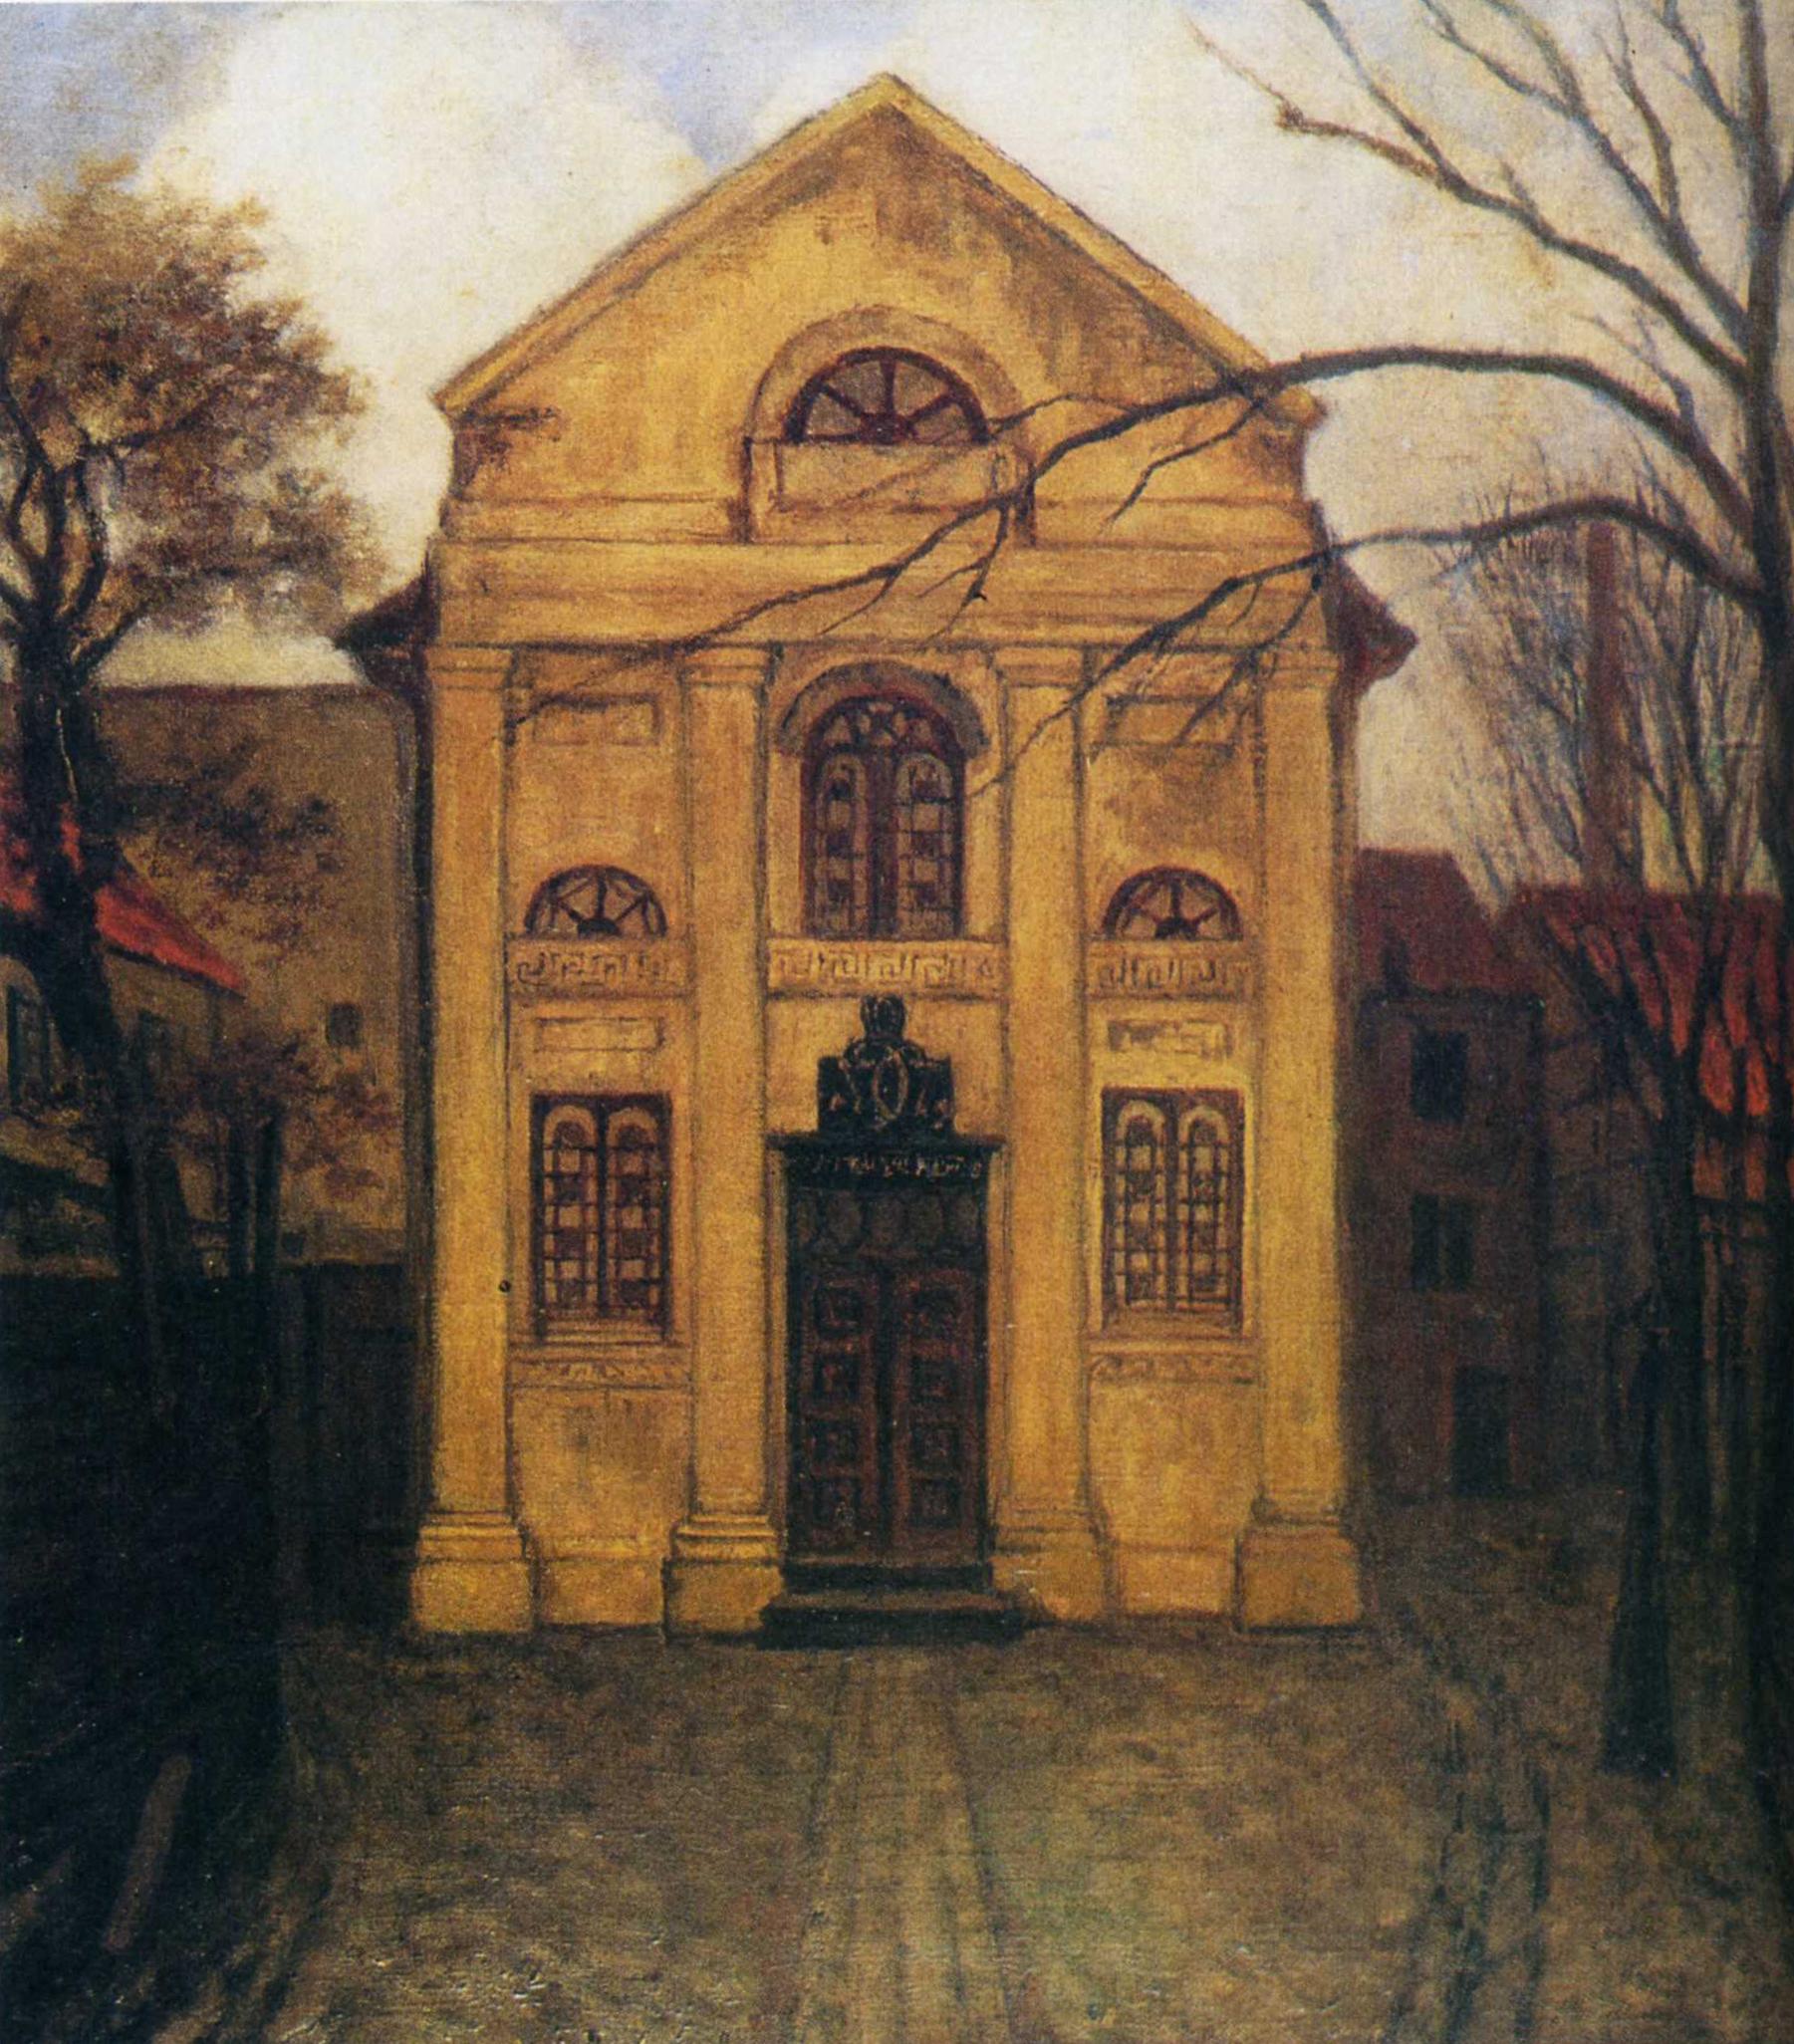 File:Synagoge Neve Shalom.jpg - Wikimedia Commons